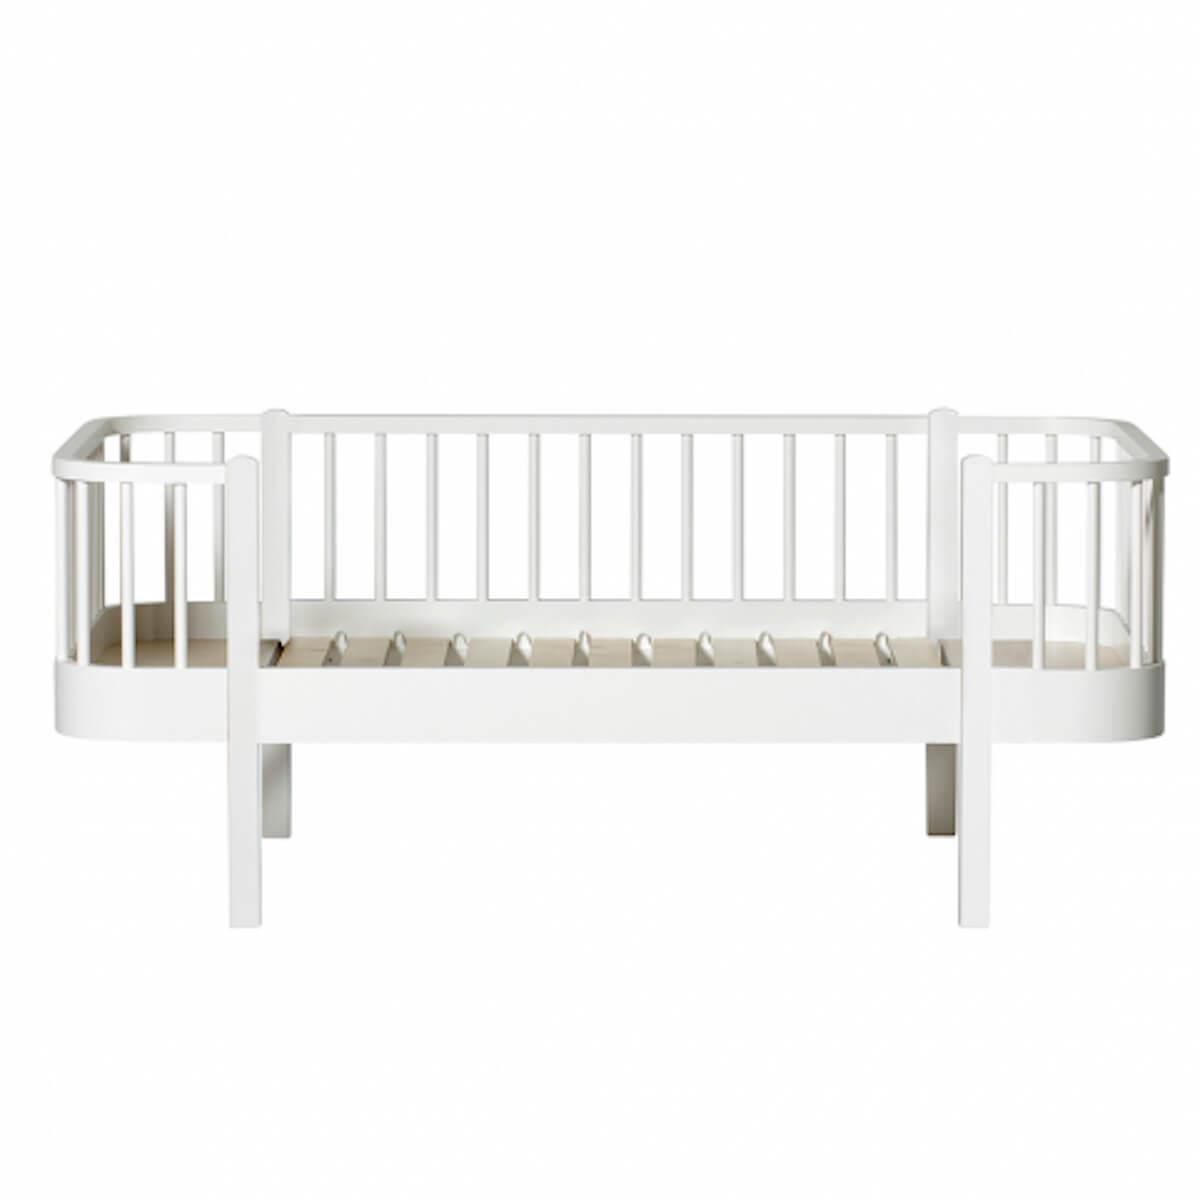 Cama-sofá evolutiva 90x160cm WOOD Oliver Furniture blanco